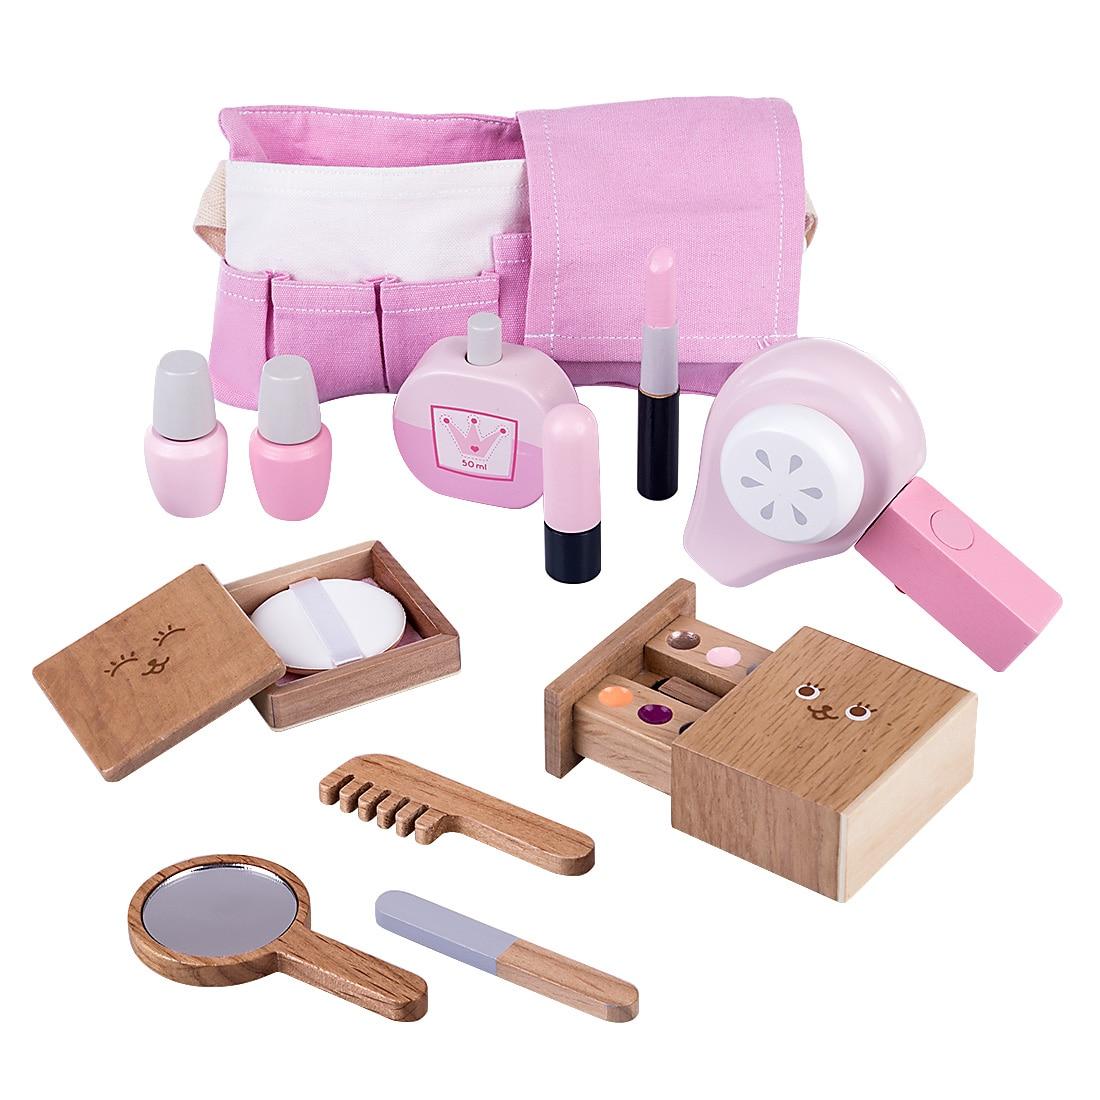 12Pcs Children Wooden Makeup Pretend Play Set Simulation Hair Dryer Toys Kids Birthdaty Gifts 2020 New Arrival